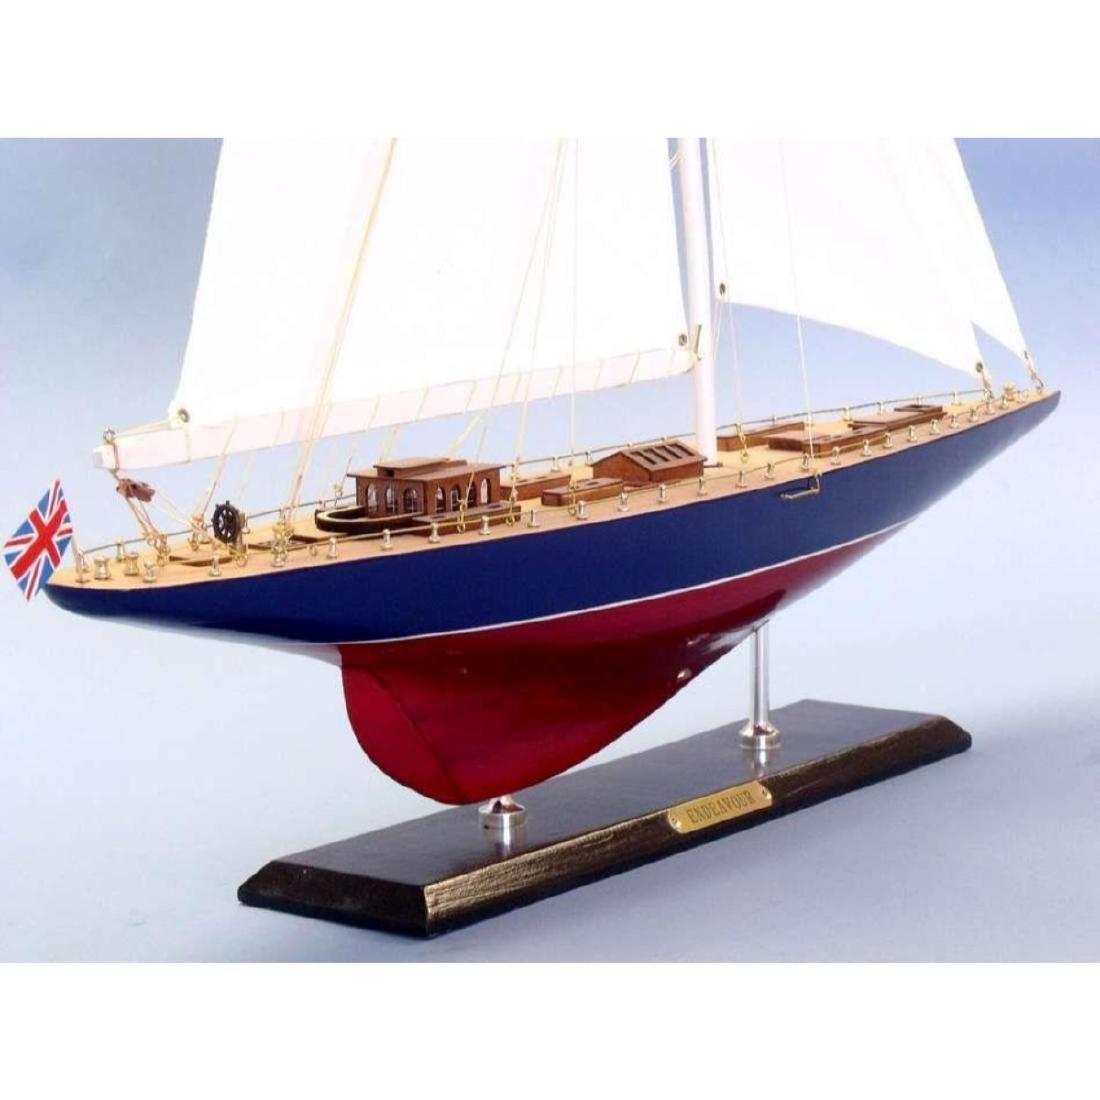 "Wooden Endeavour Limited Model Sailboat Decoration 35"" - 4"